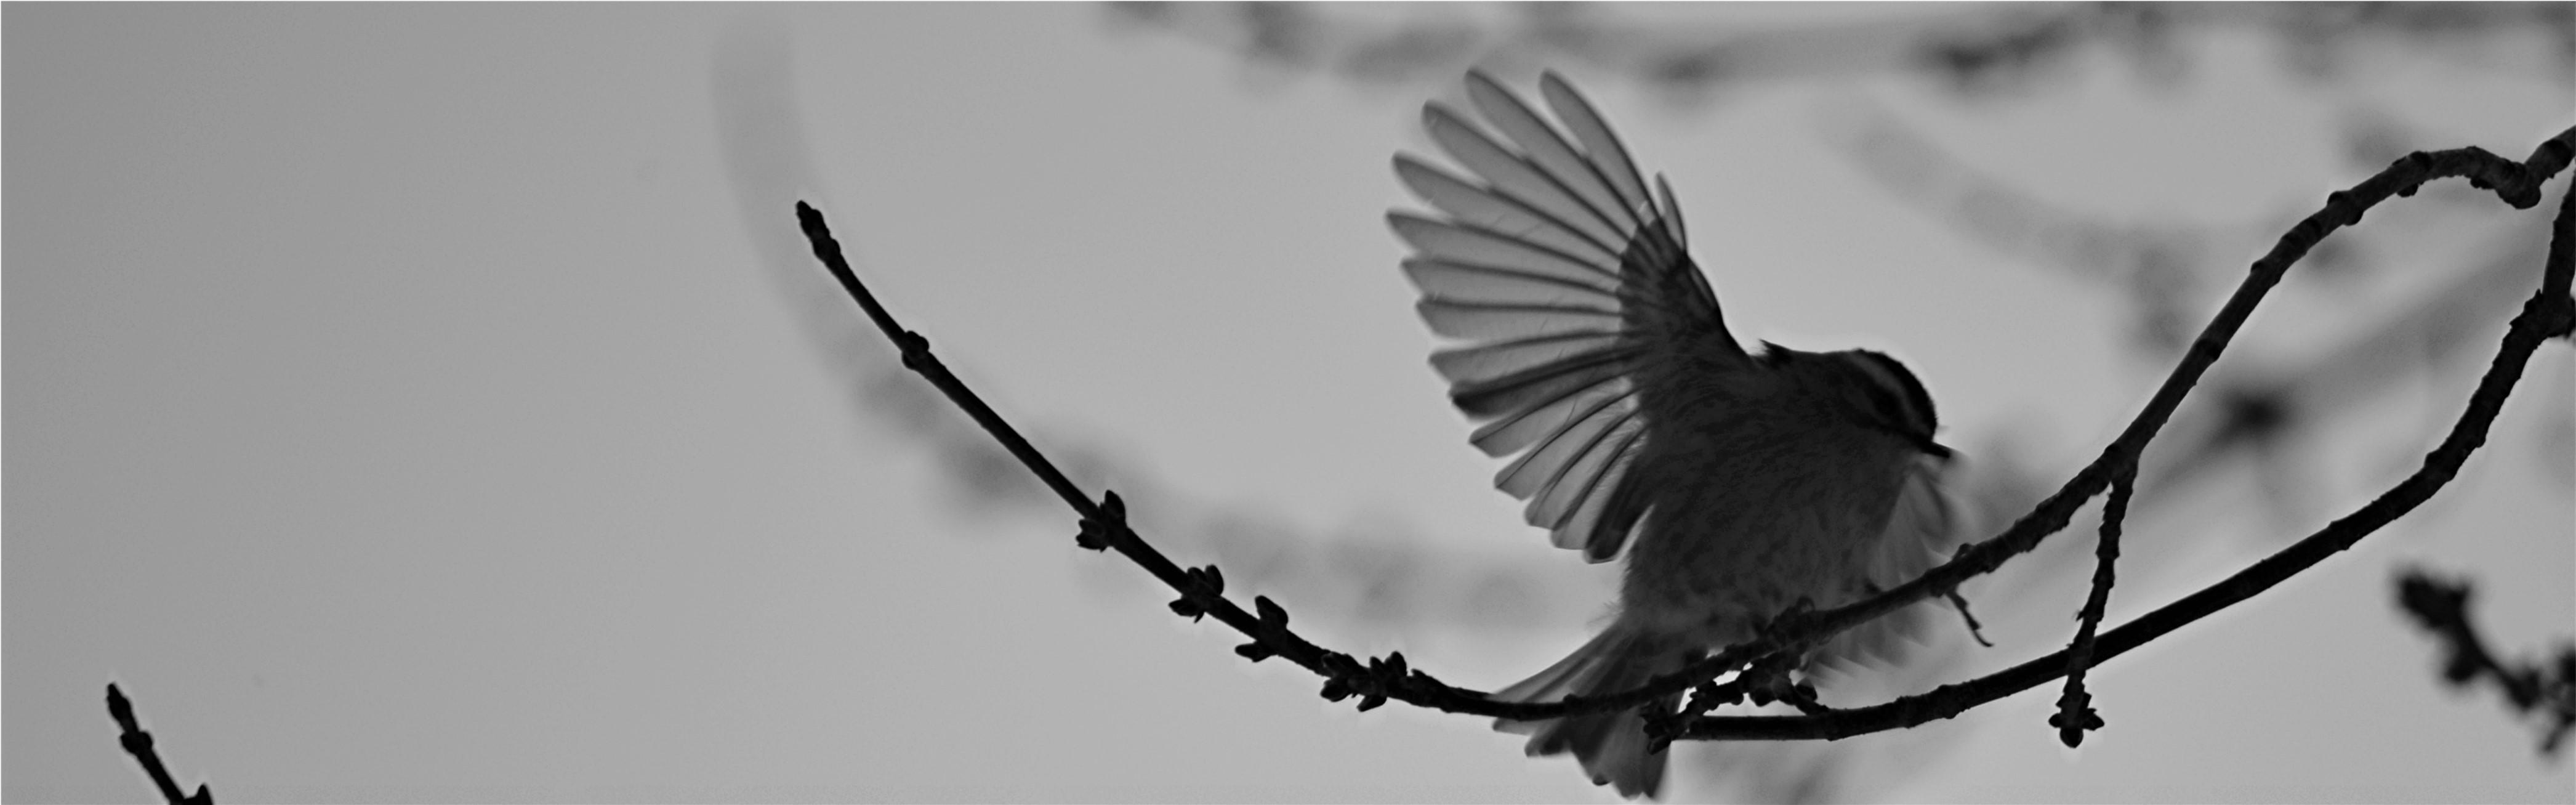 Heron Ecological, LLC